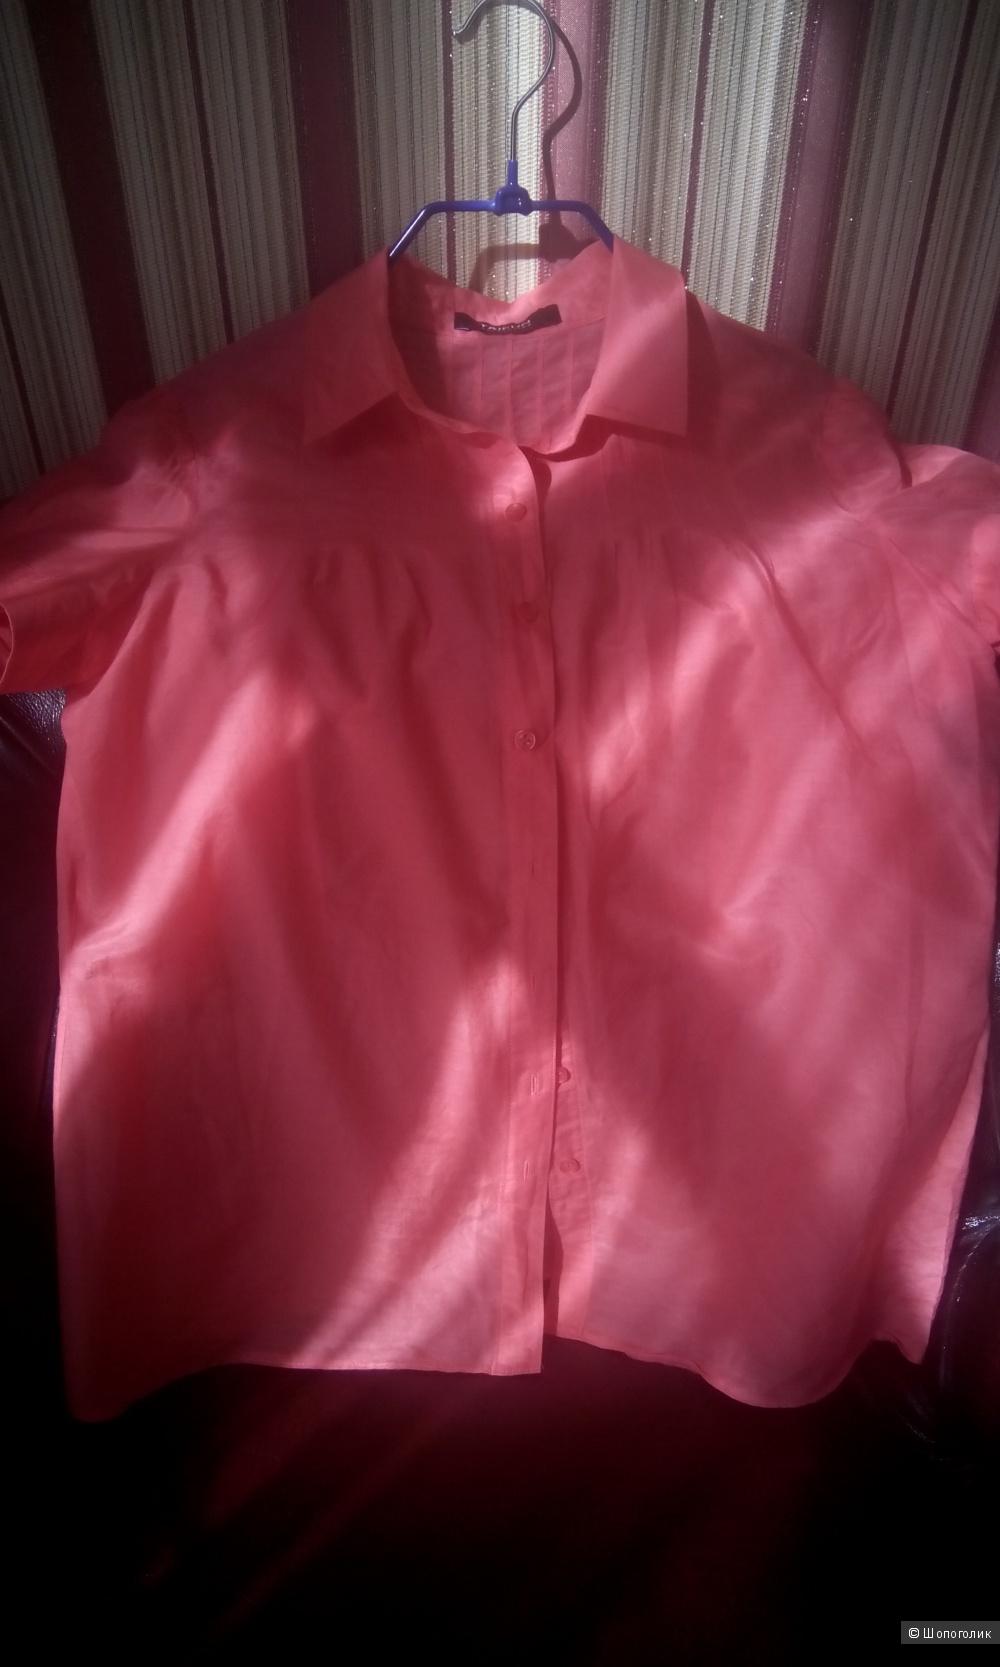 Прекрасная кораллового цвета блузка Taifun Collection 44-46 размер